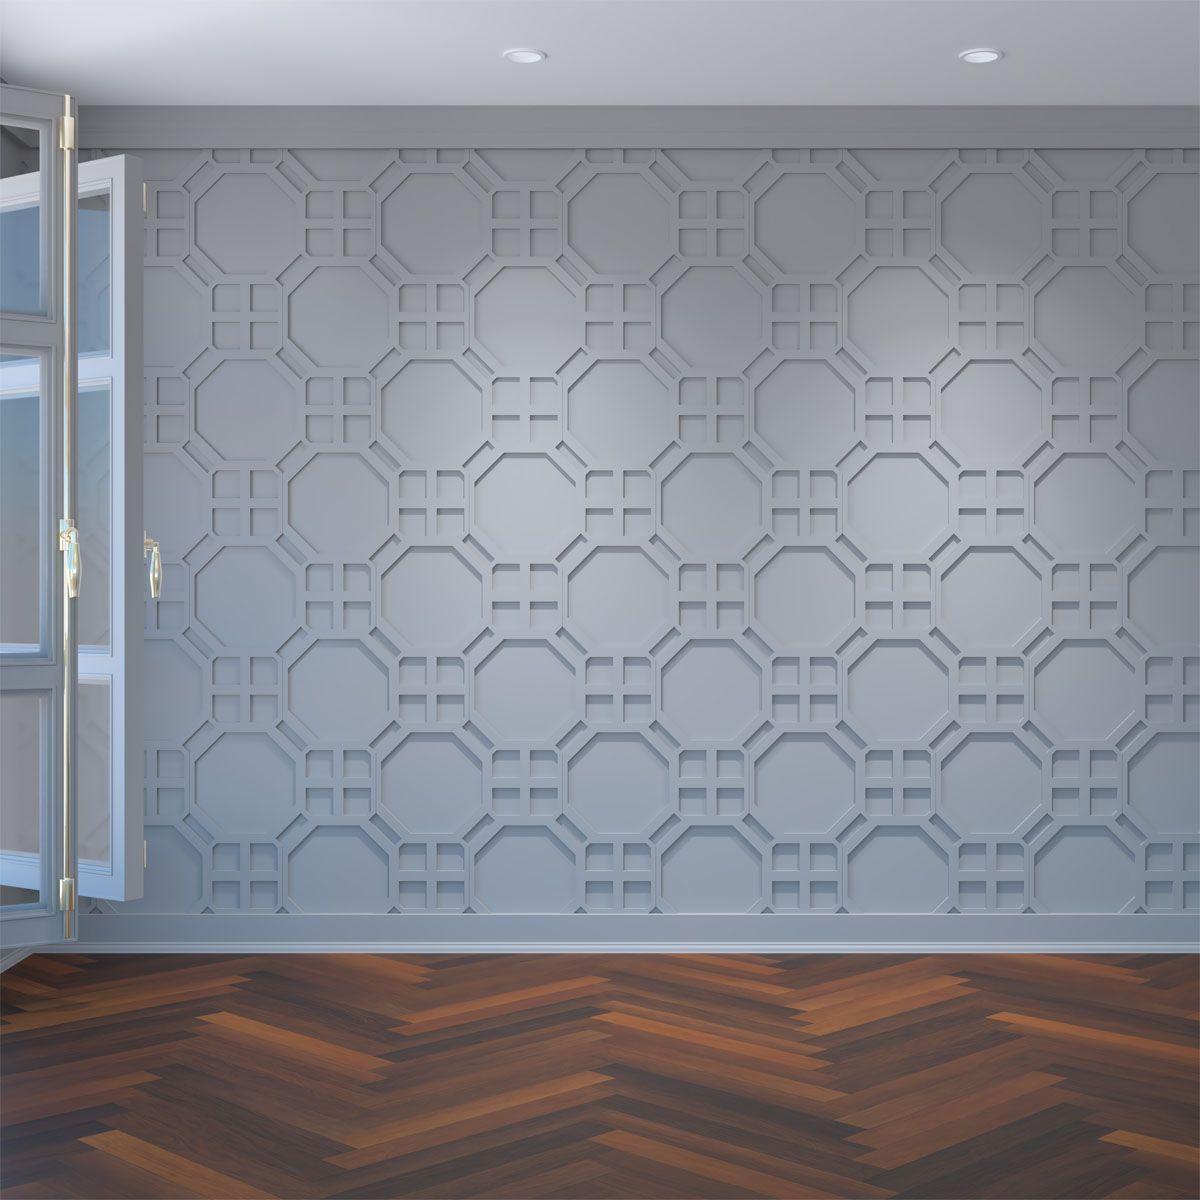 21+ Decorative wall paneling home depot ideas